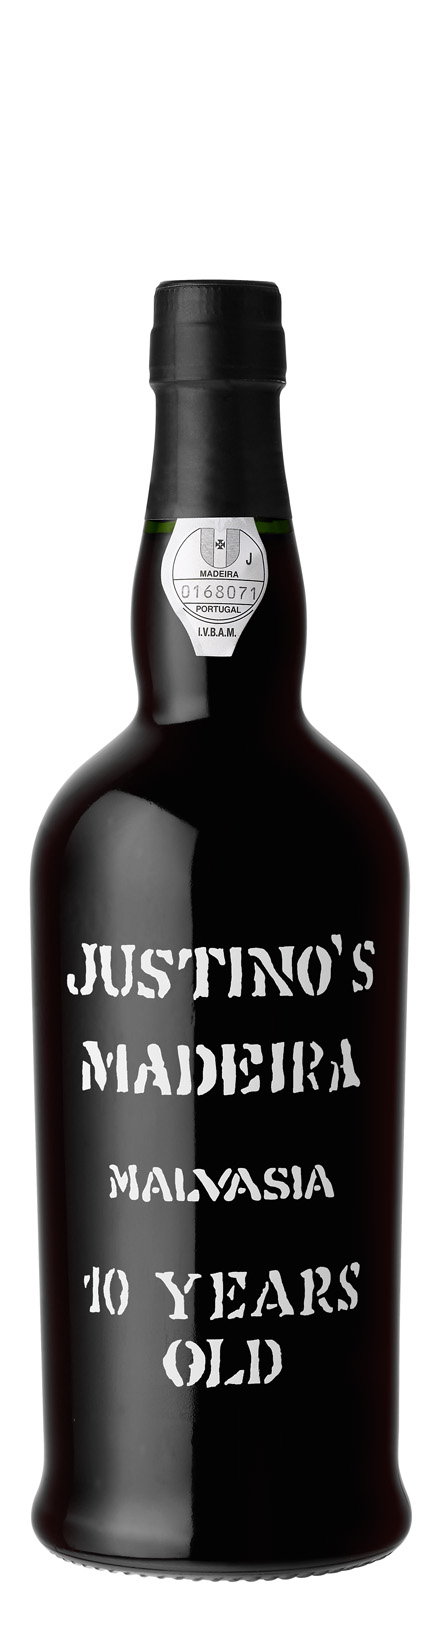 Justino's Madeira, 10 Year Old Malvasia NV